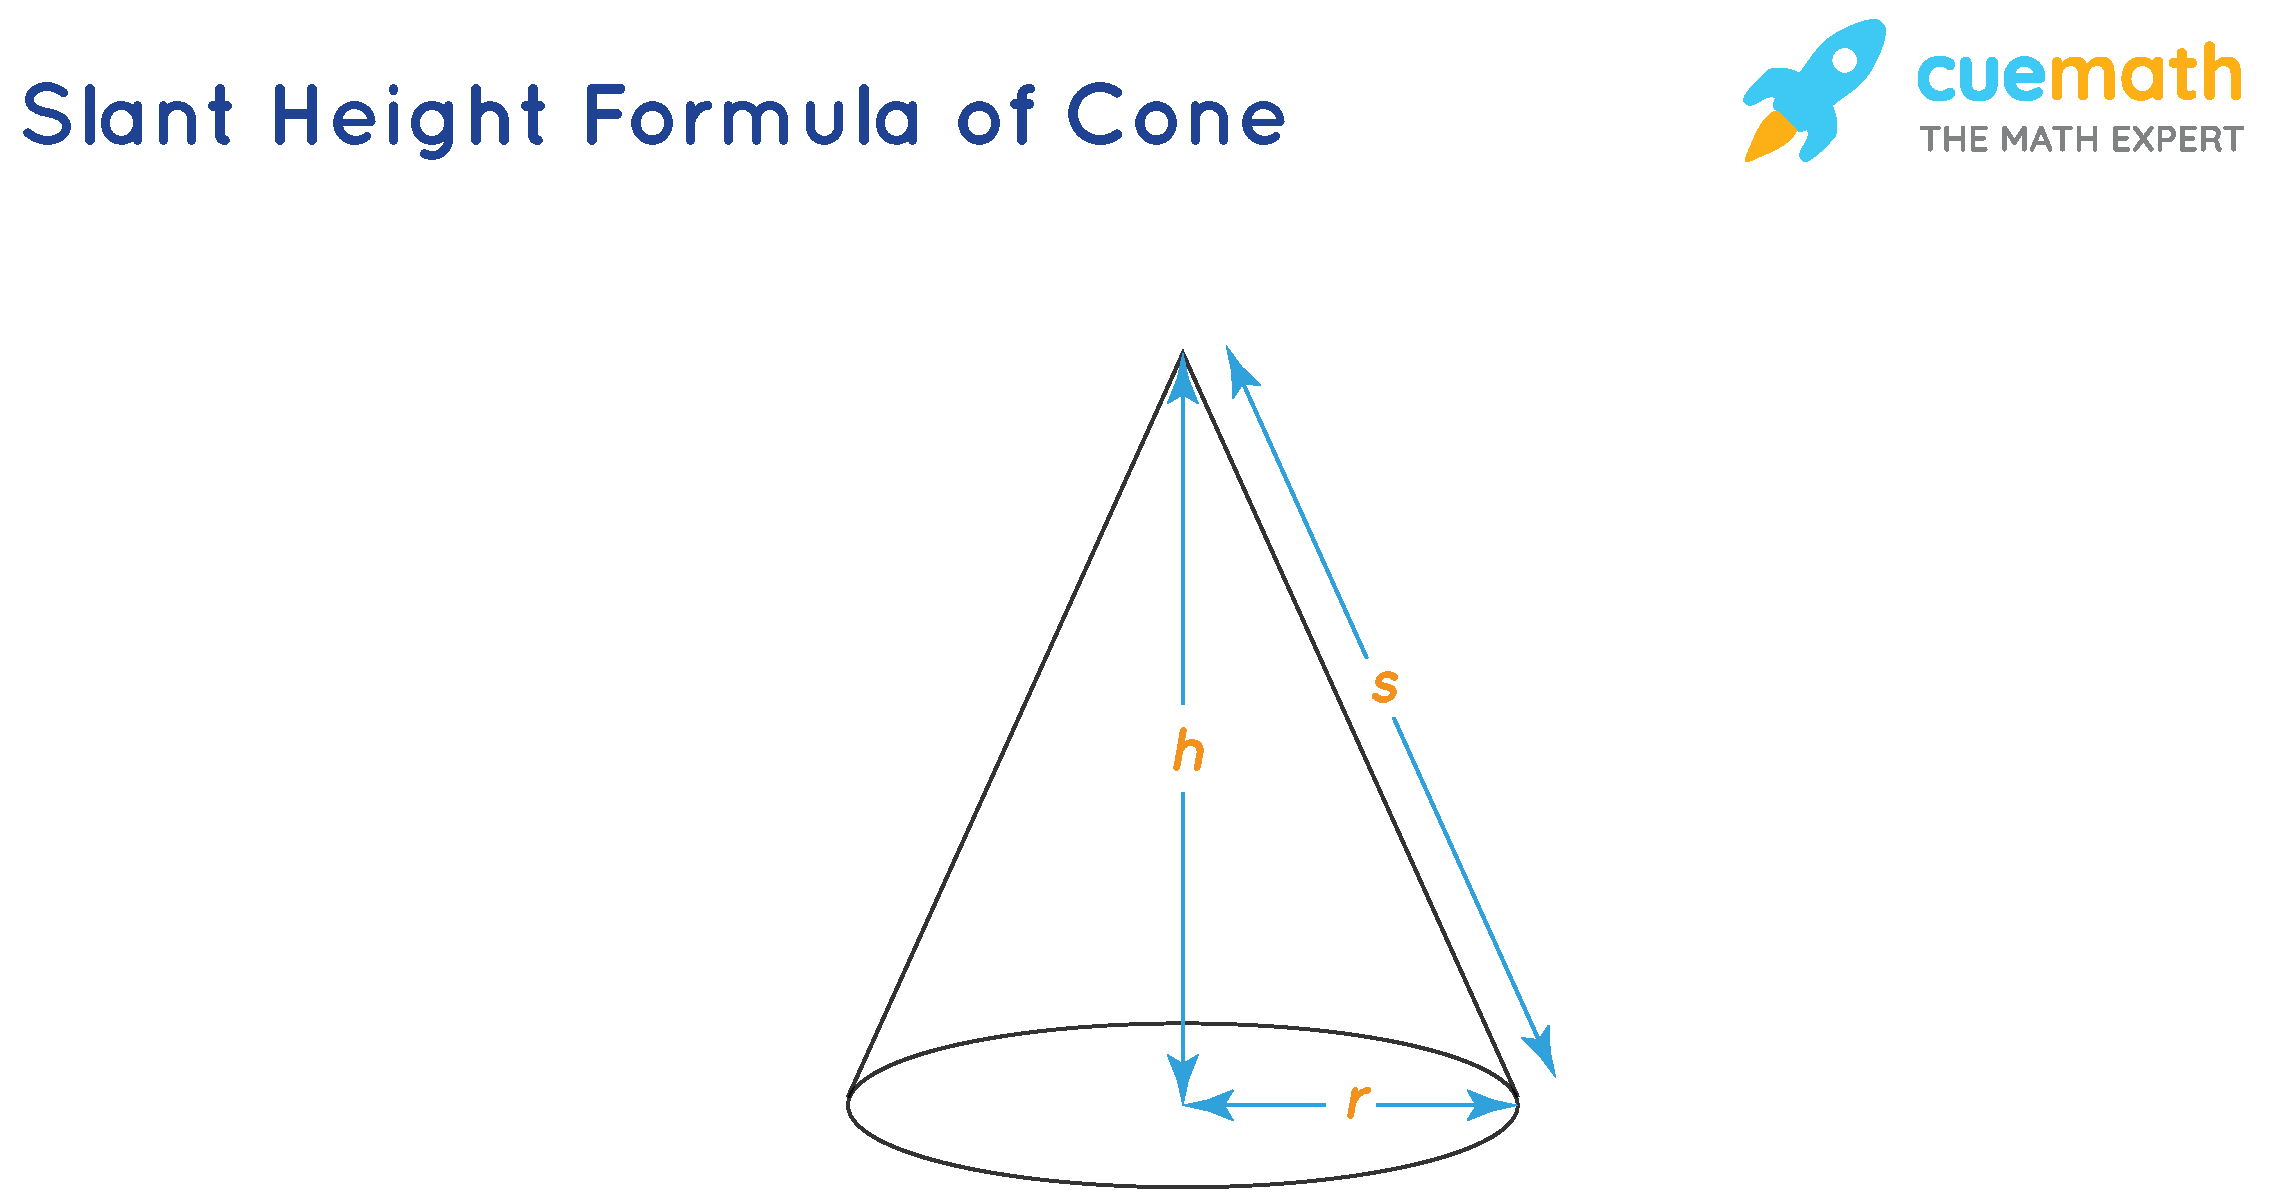 Slant height of a Cone formula